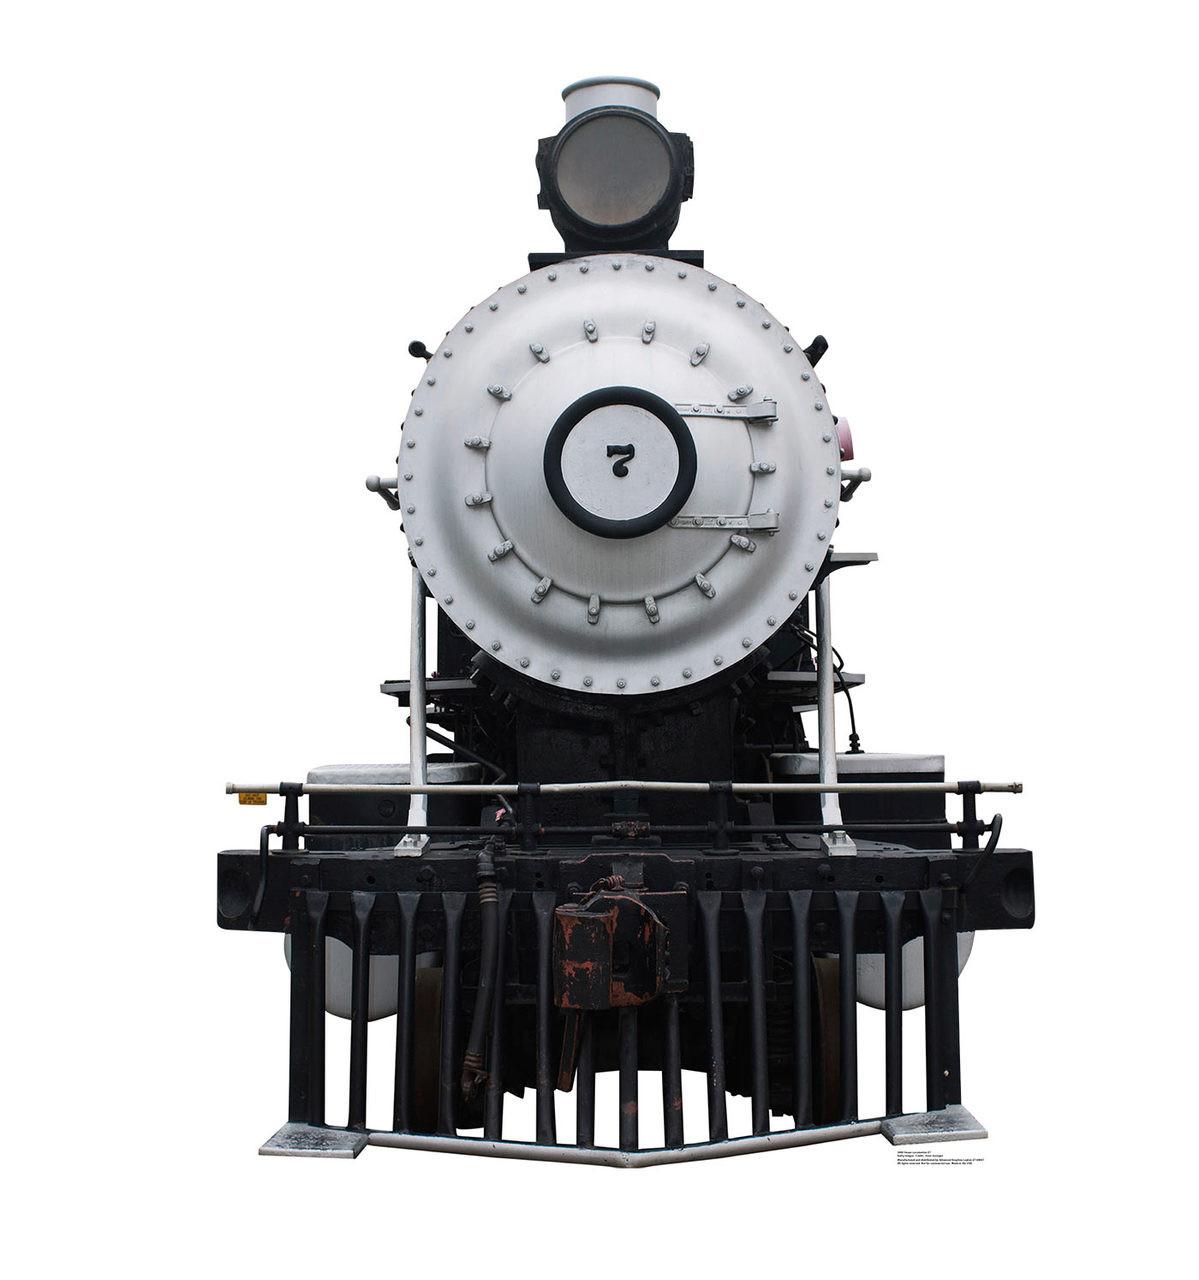 Life-size Steam Locomotive #7 Cardboard Standup  Cardboard Cutout